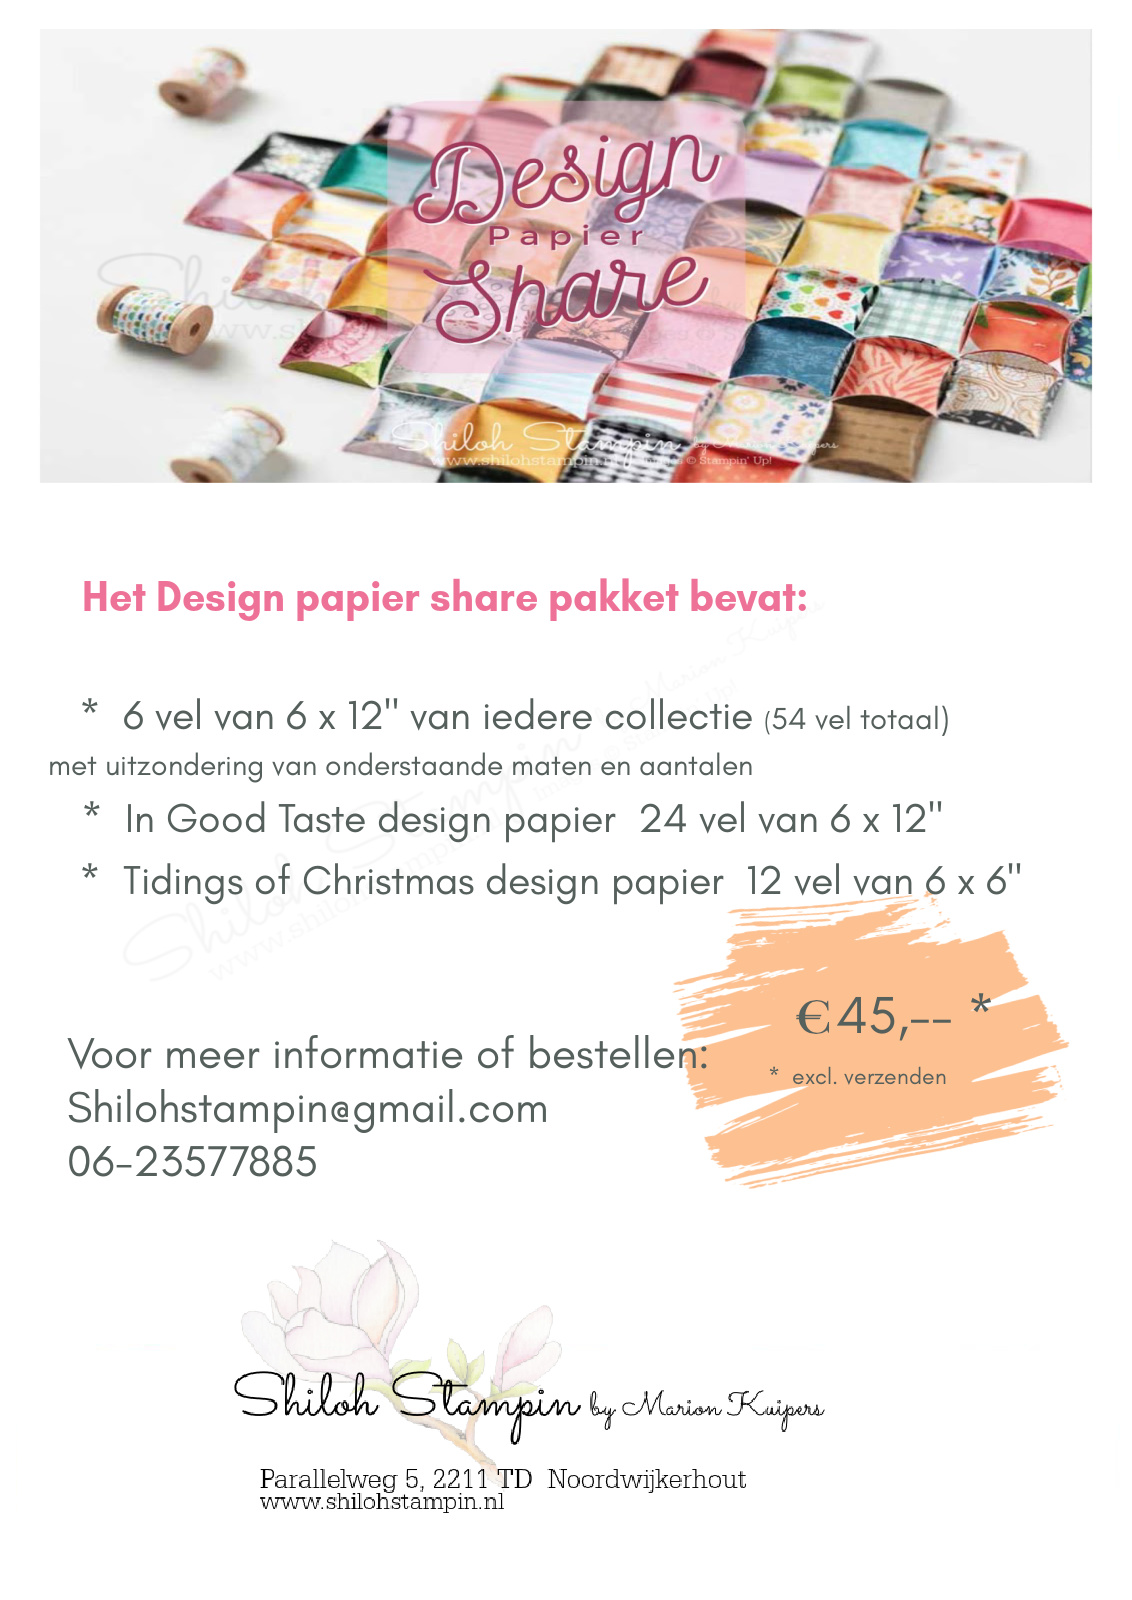 Design paper Share